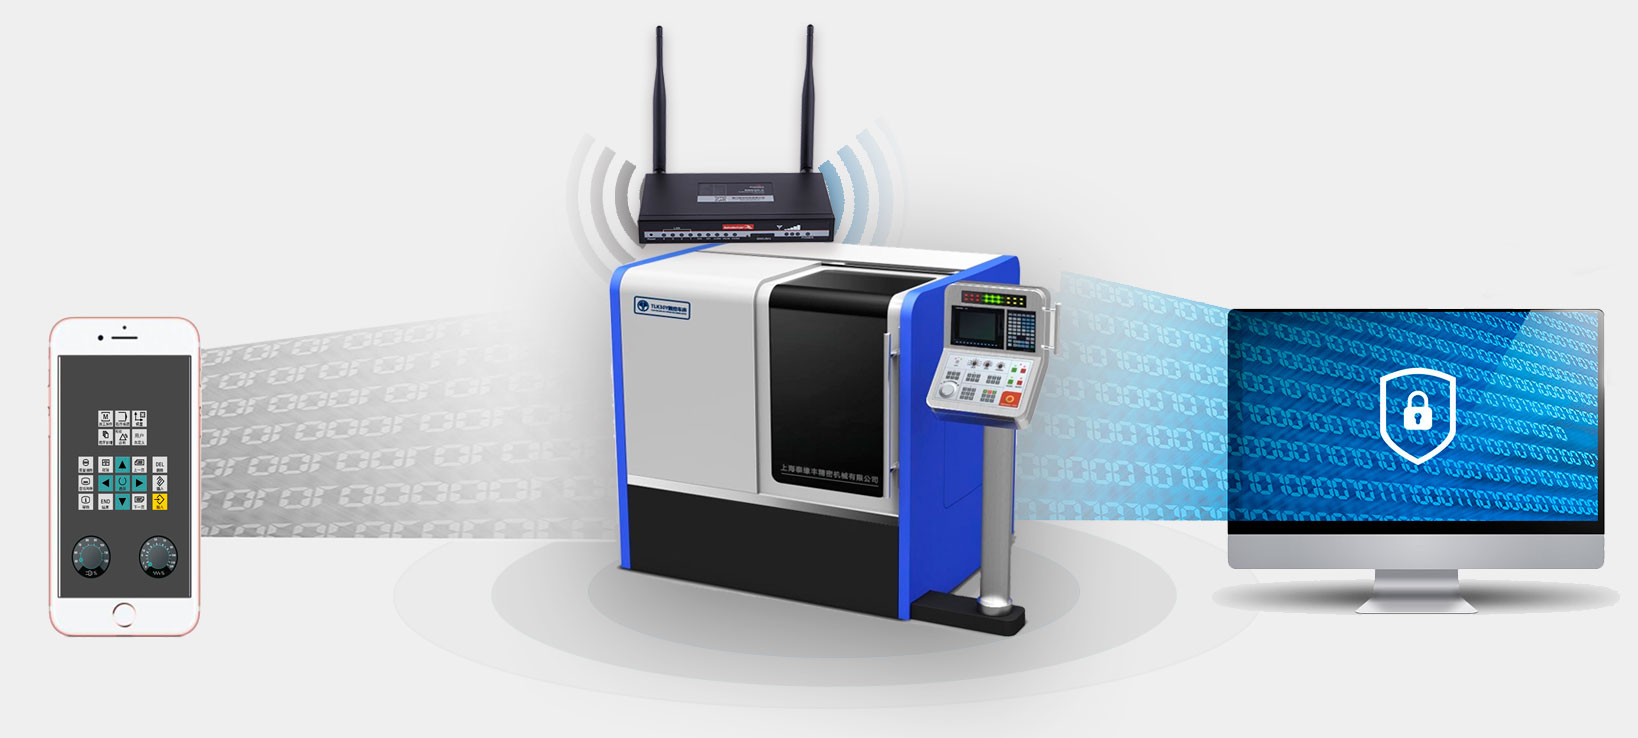 BMR420双卡工业路由器支持wifi.jpg